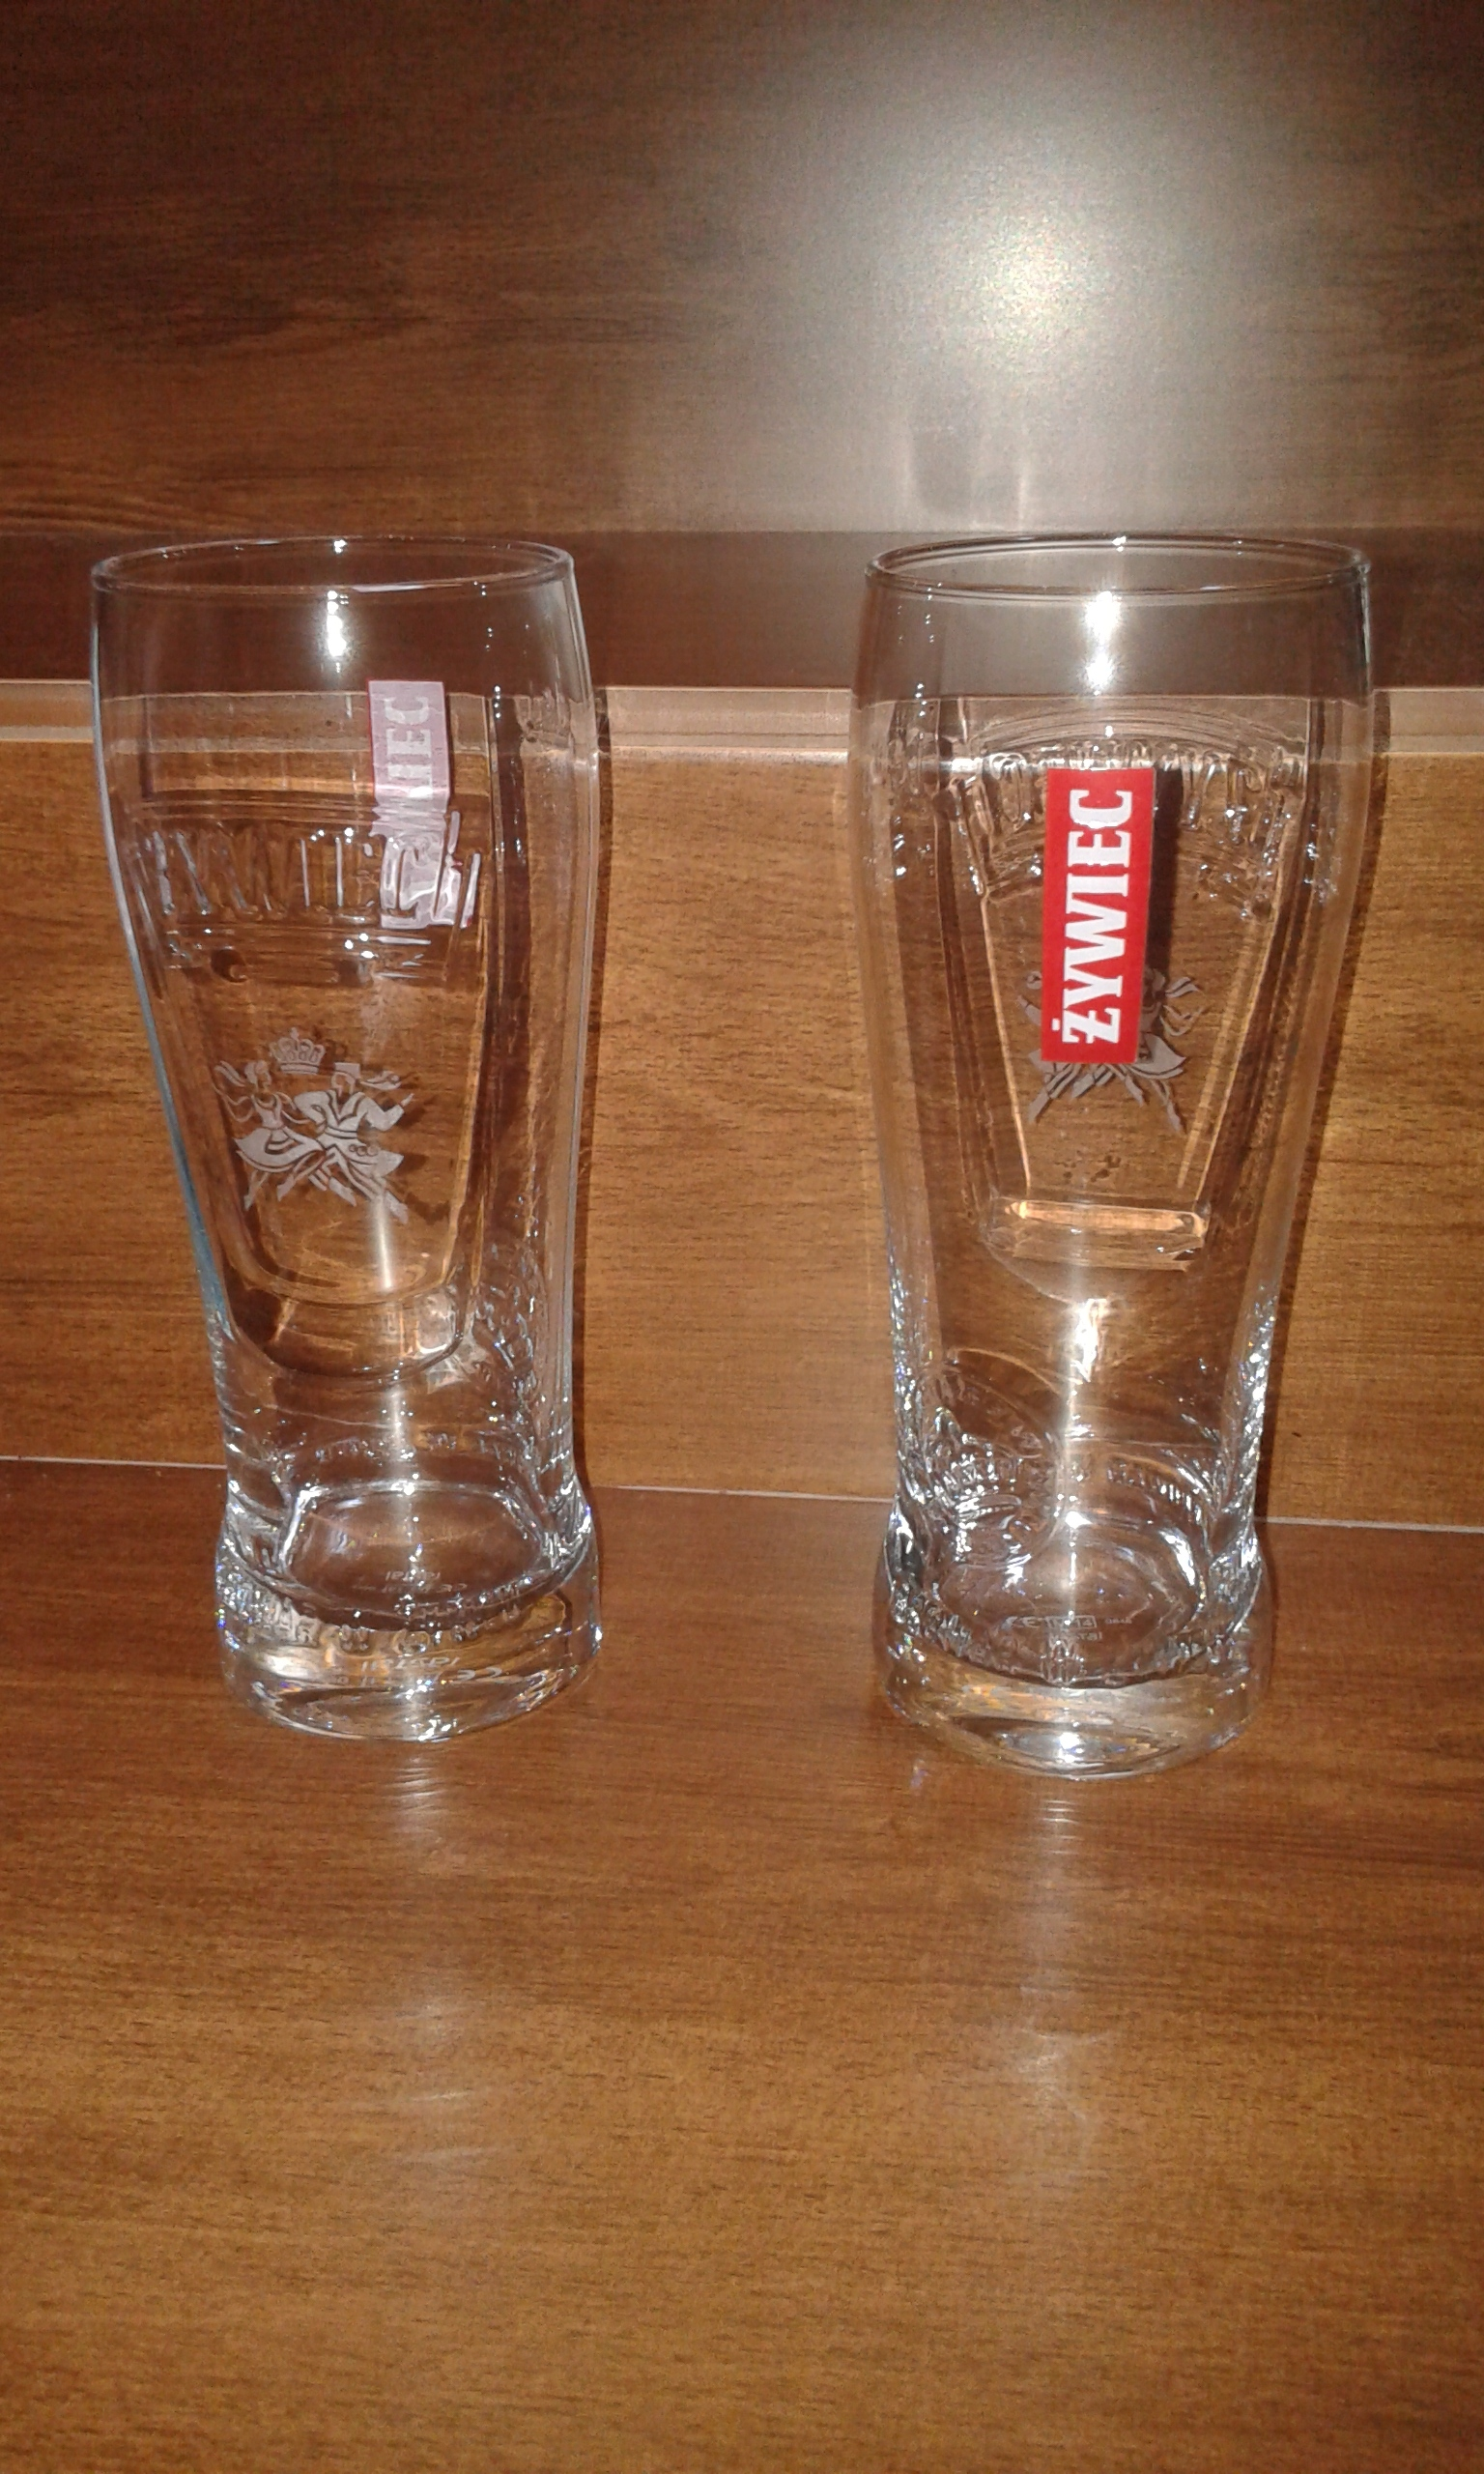 Item Żywiec 0,5 l in compl. 6 PCs NEW Glasses, beer Mugs Pokal